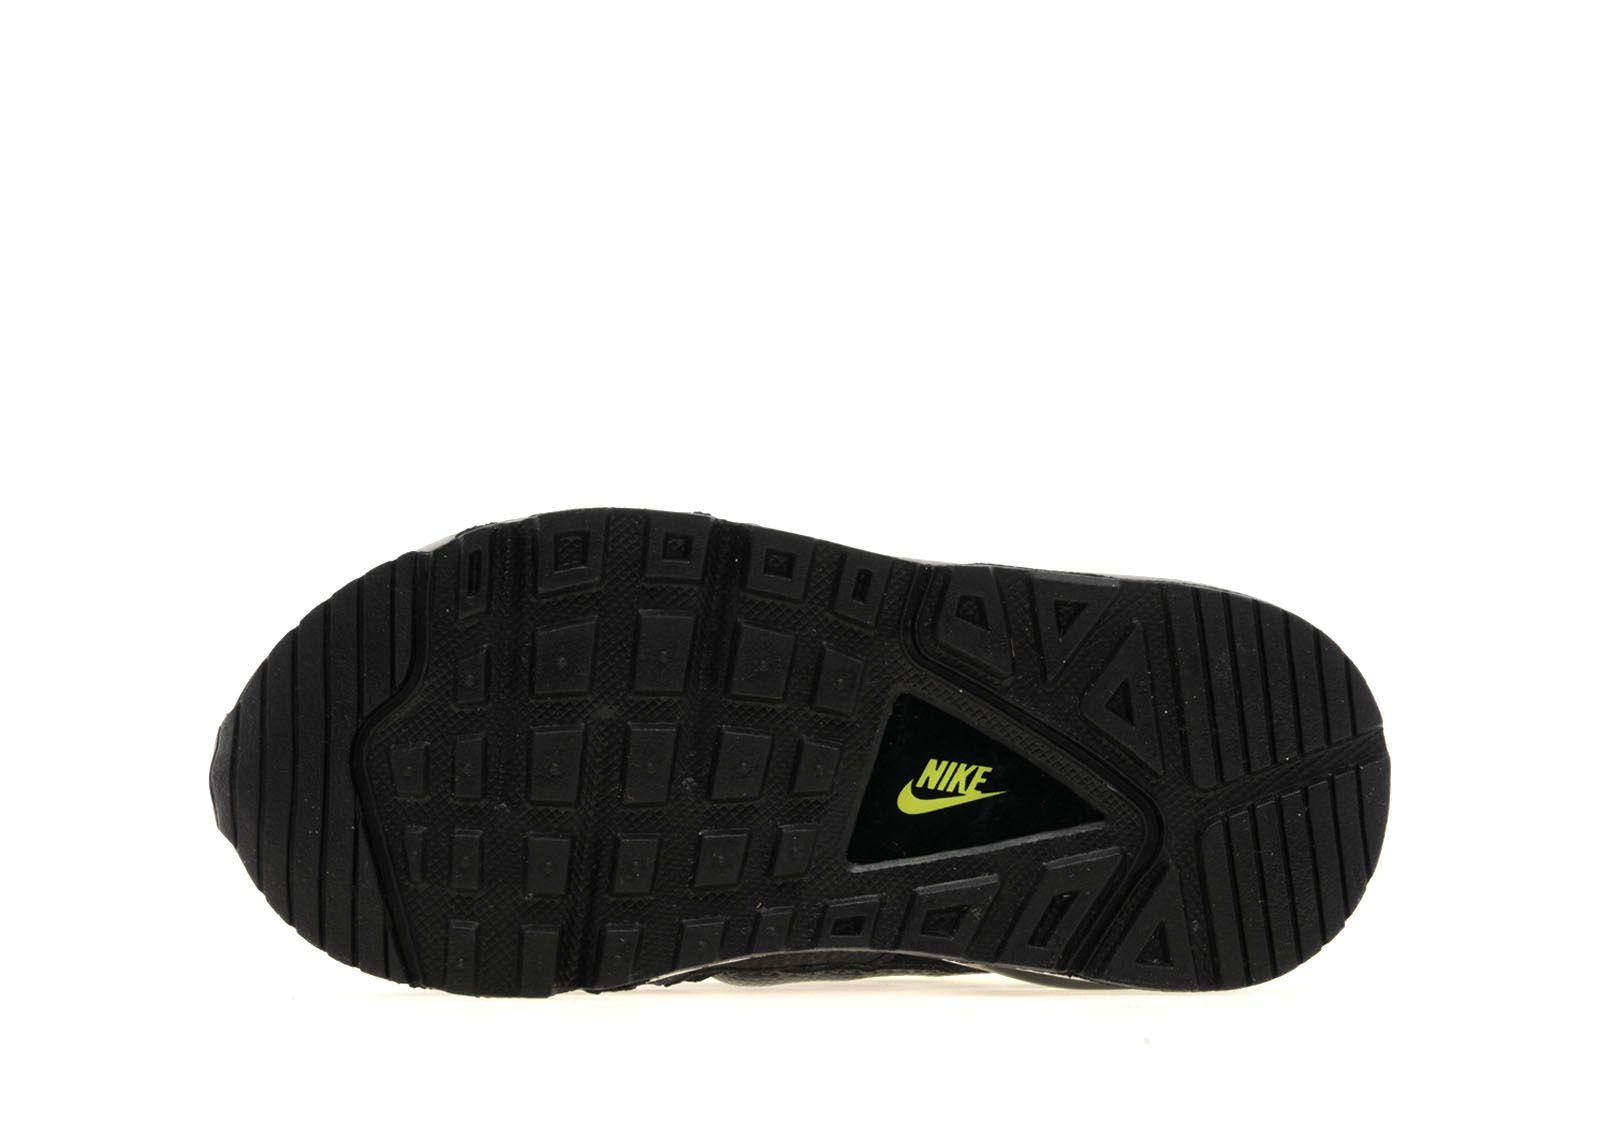 Nike Air Max Command Infants